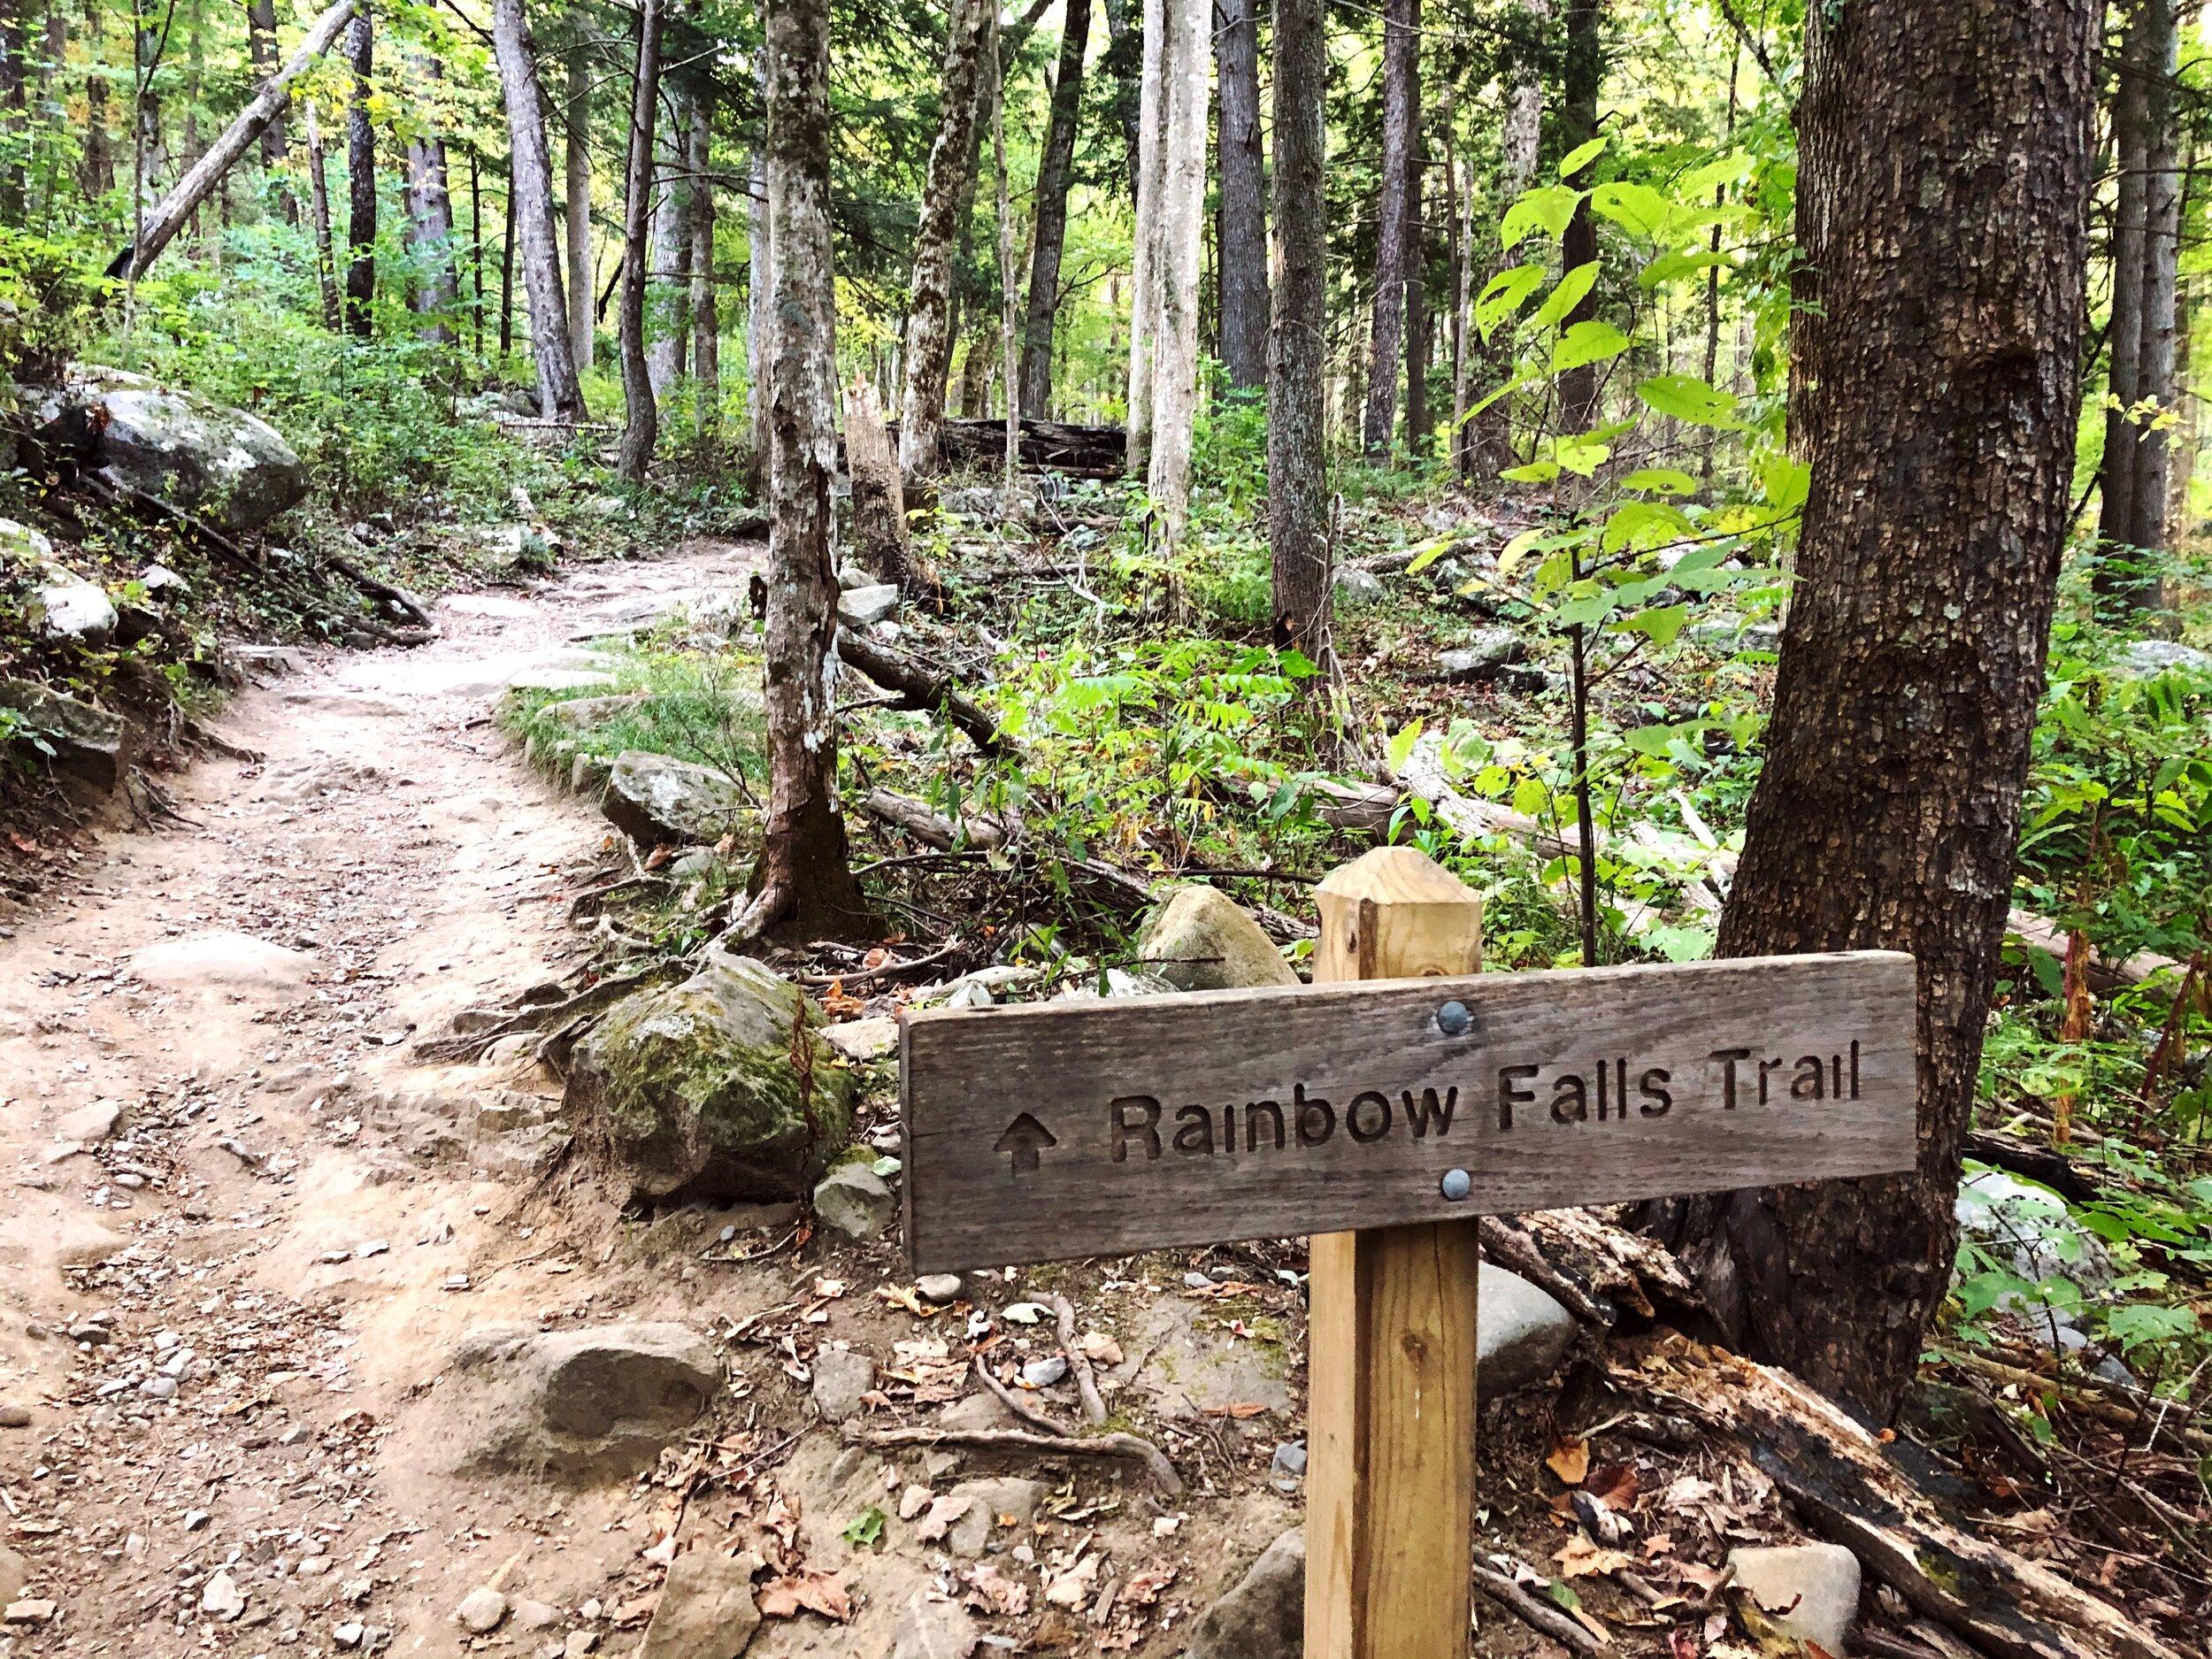 mount-leconte-rainbow falls trail-great-smoky-mountains-gatlinberg-tennessee0422.JPG